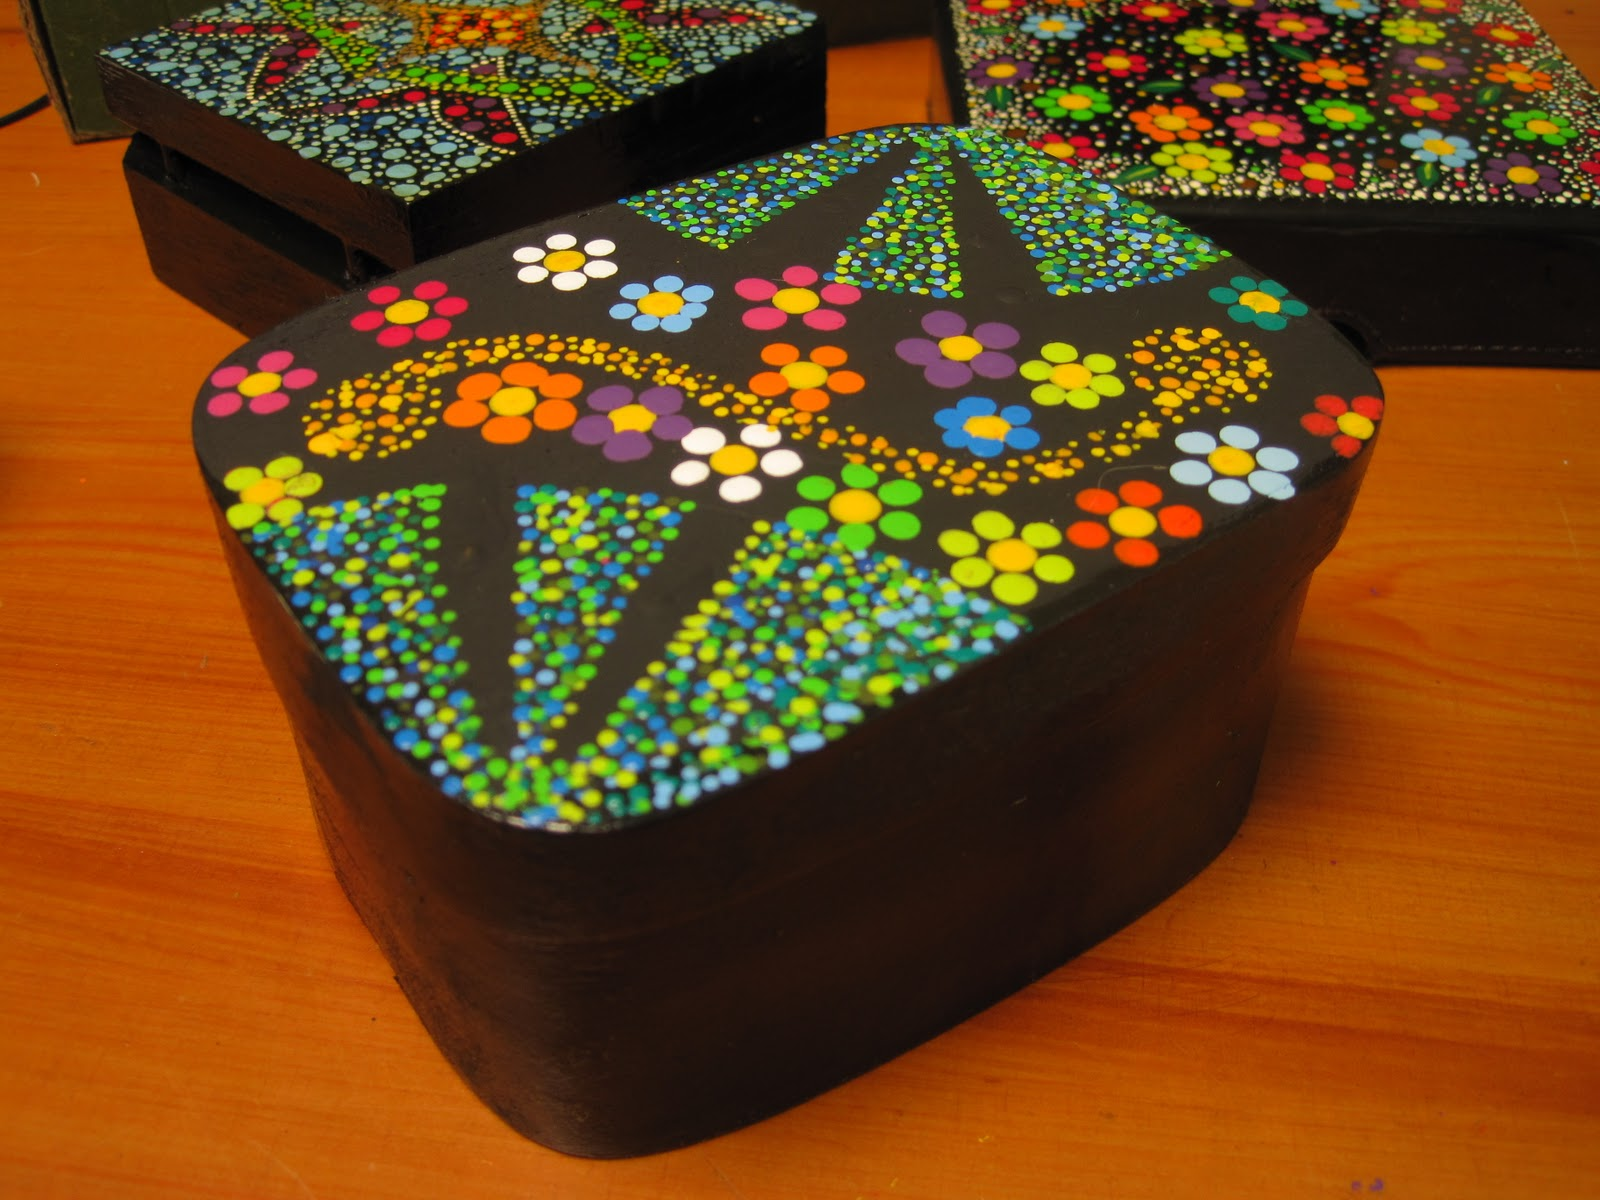 Manualidades abbad art armenia colombia cajas decorativas - Cajas de almacenaje decorativas ...